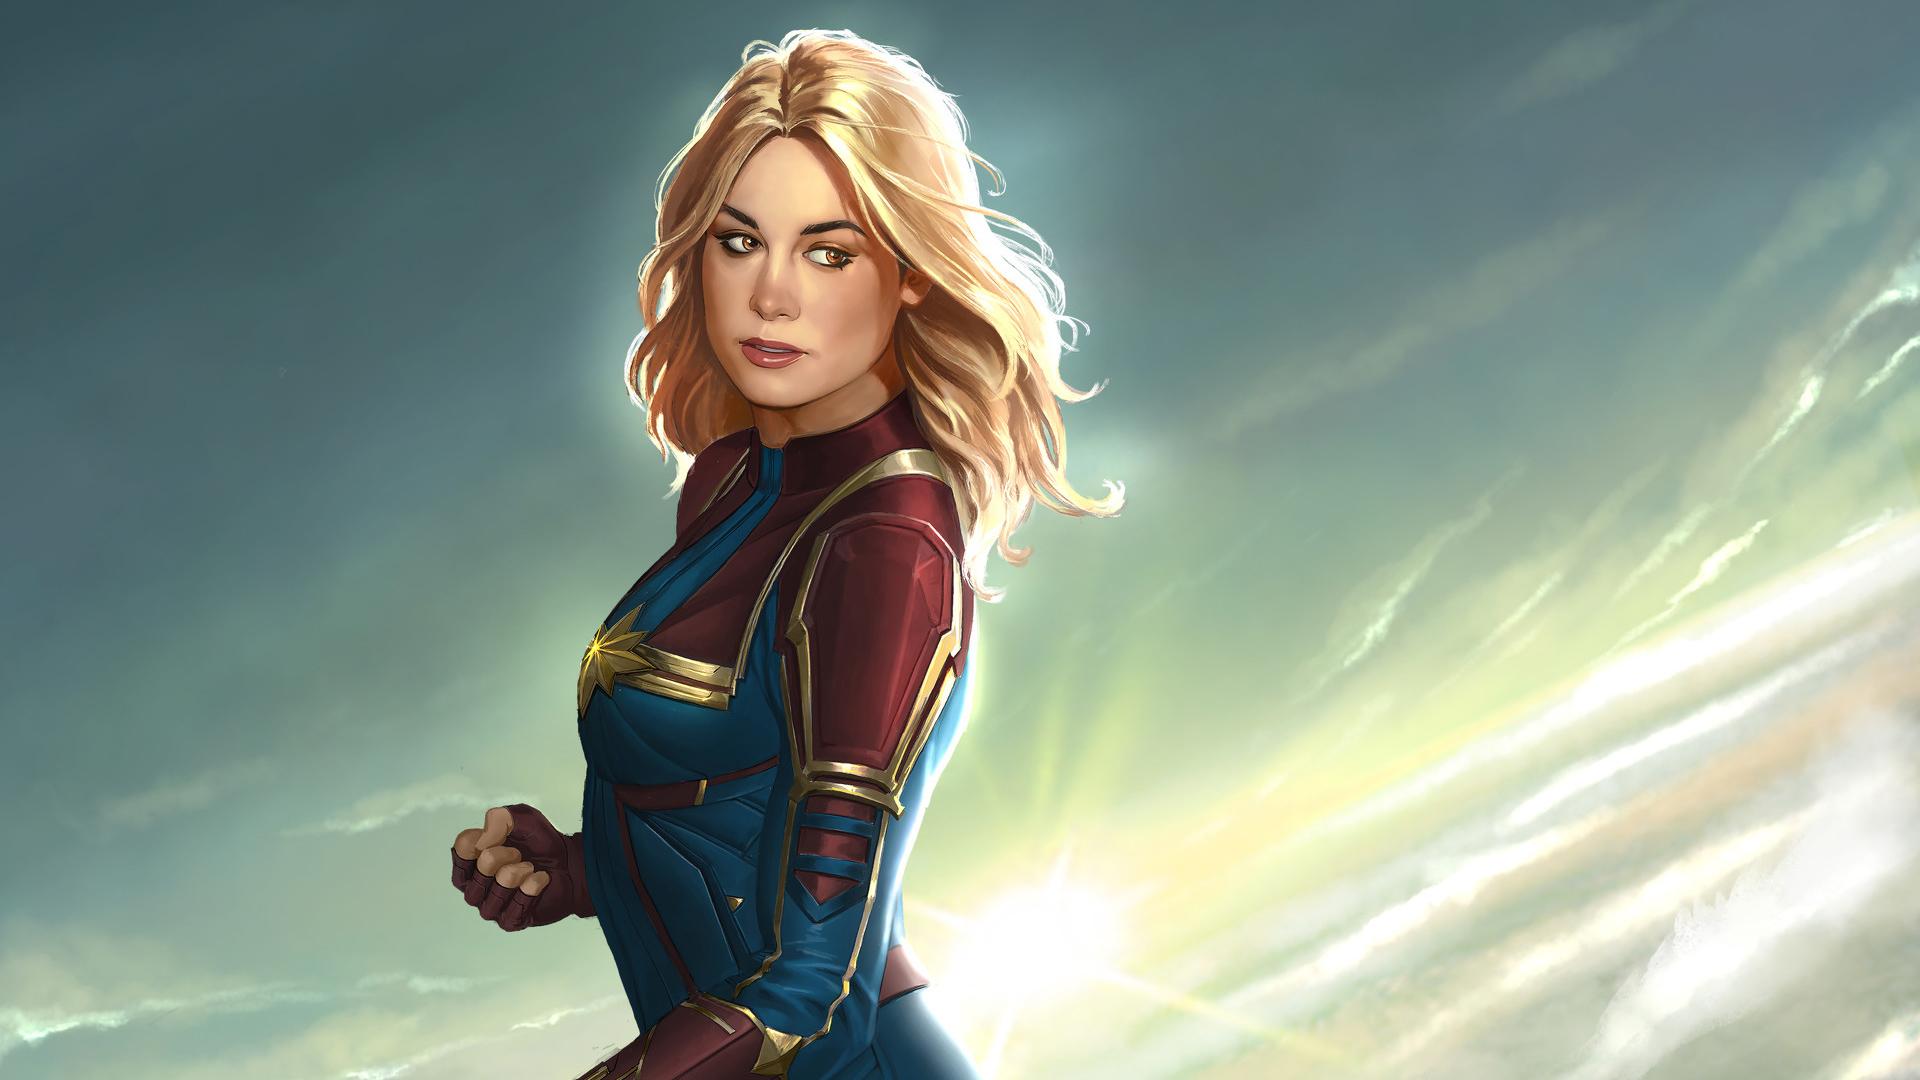 Captain Marvel New Artworks Hd Superheroes 4k Wallpapers Images